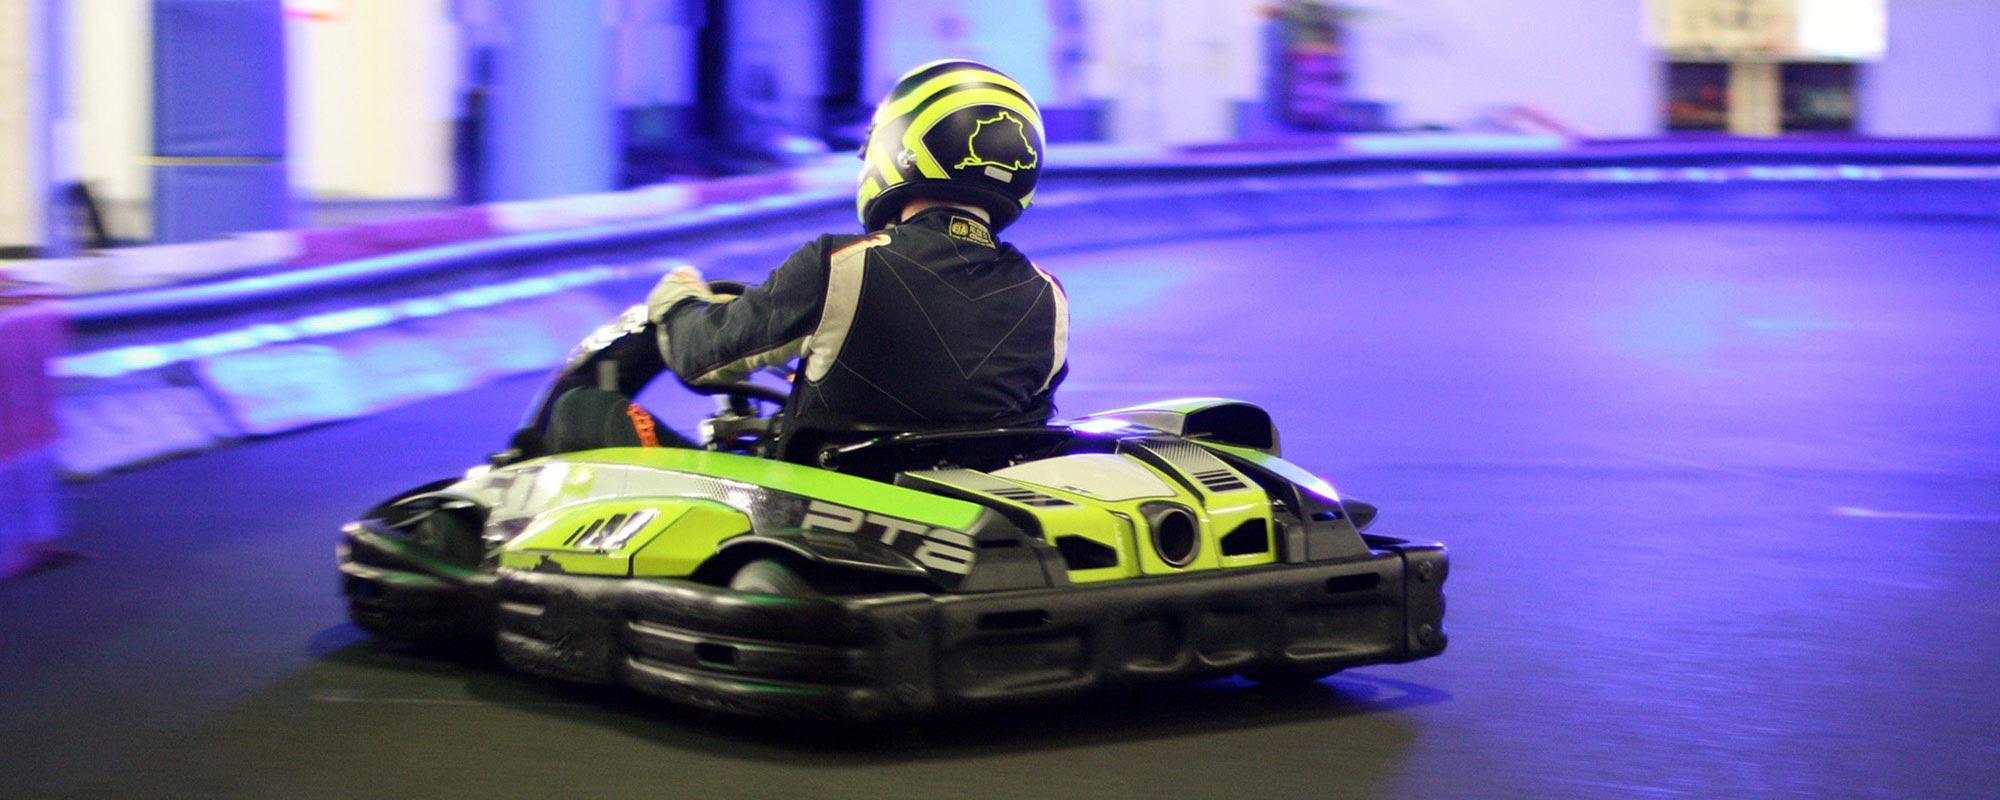 ebafkc-karting-2000x800-12